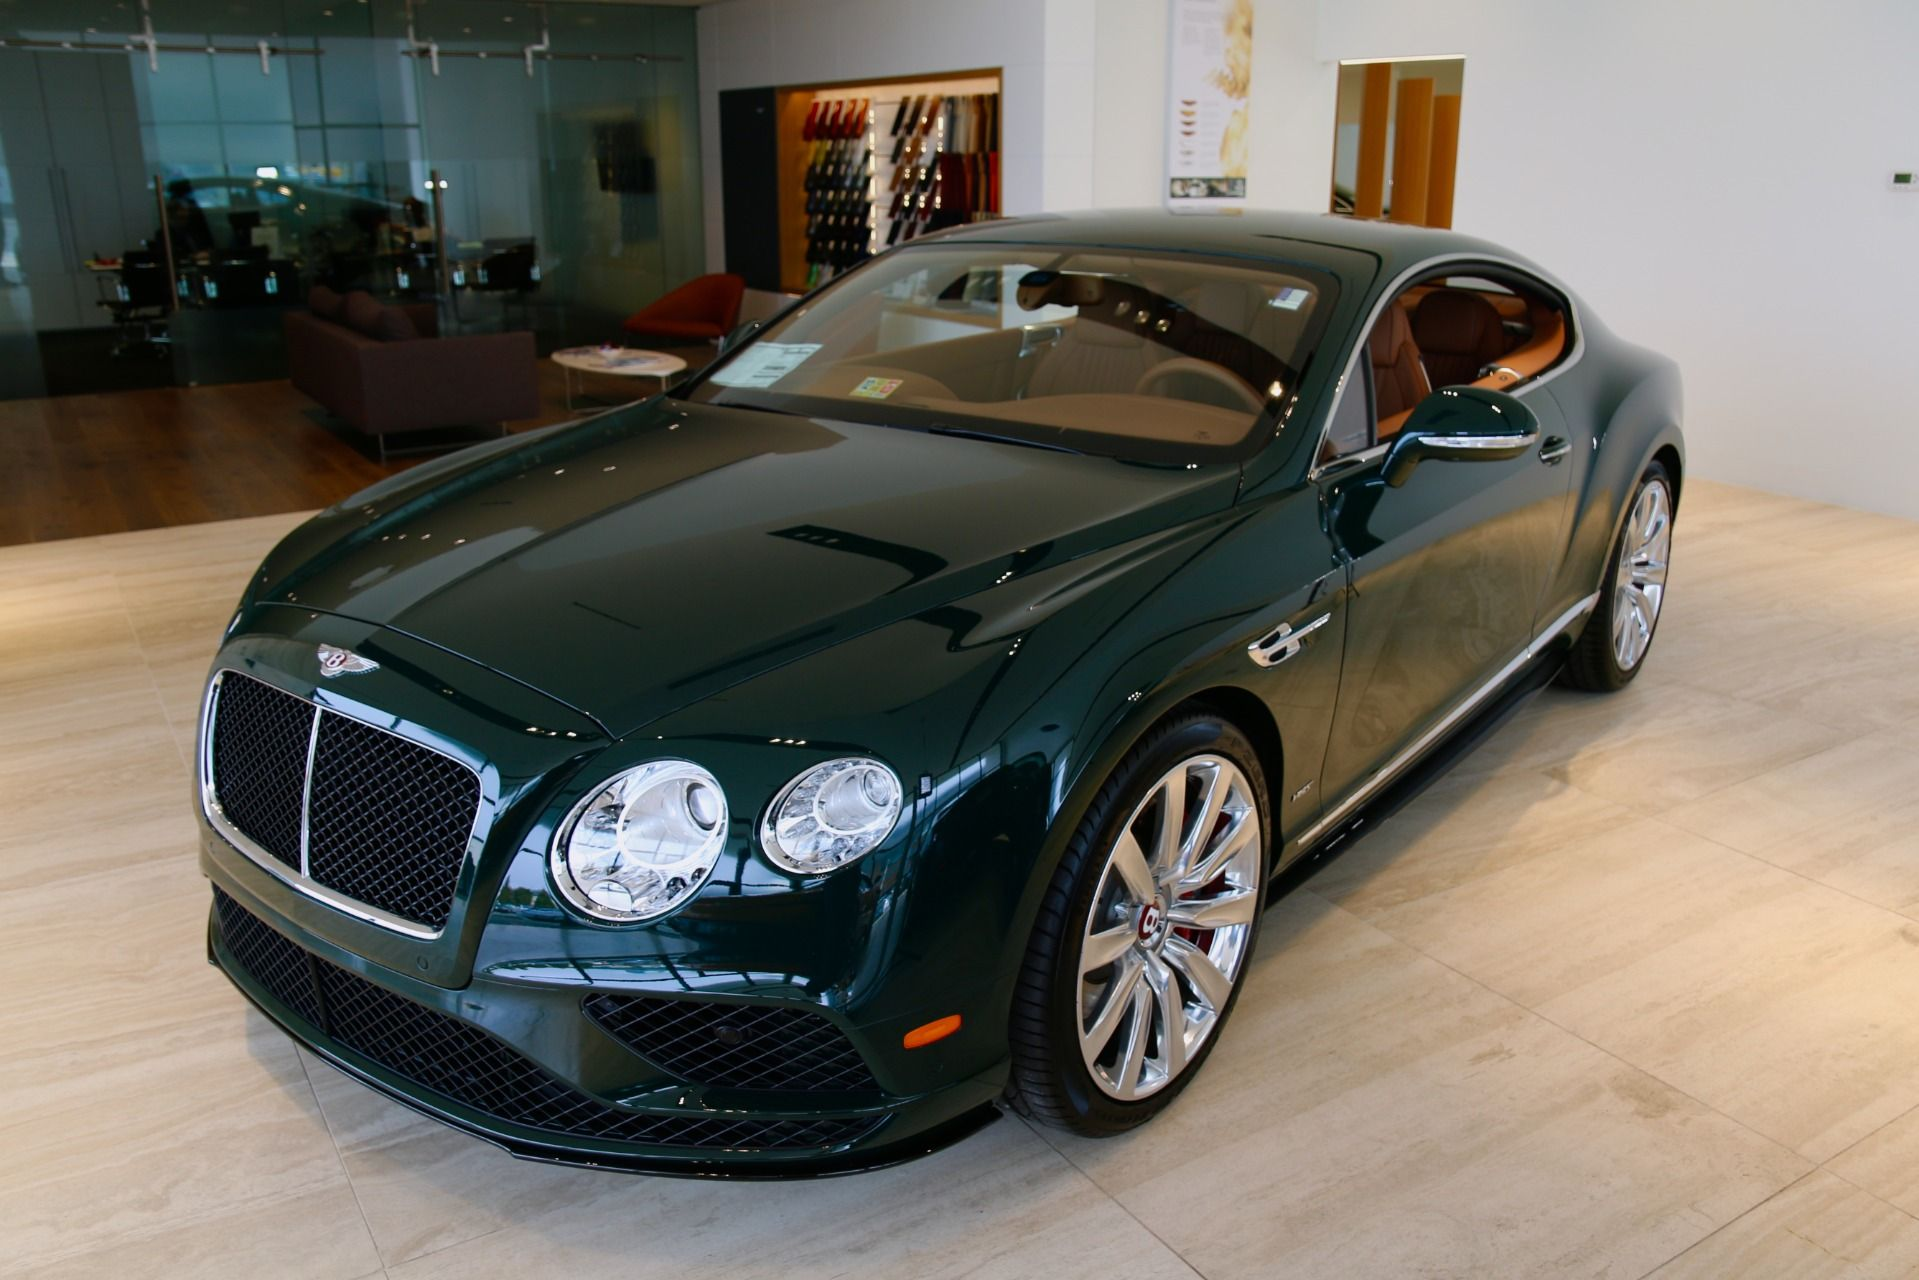 2017 Bentley Continental Gt V8 S Bentley Continental Gt V8 Bentley Continental Bentley Continental Gt